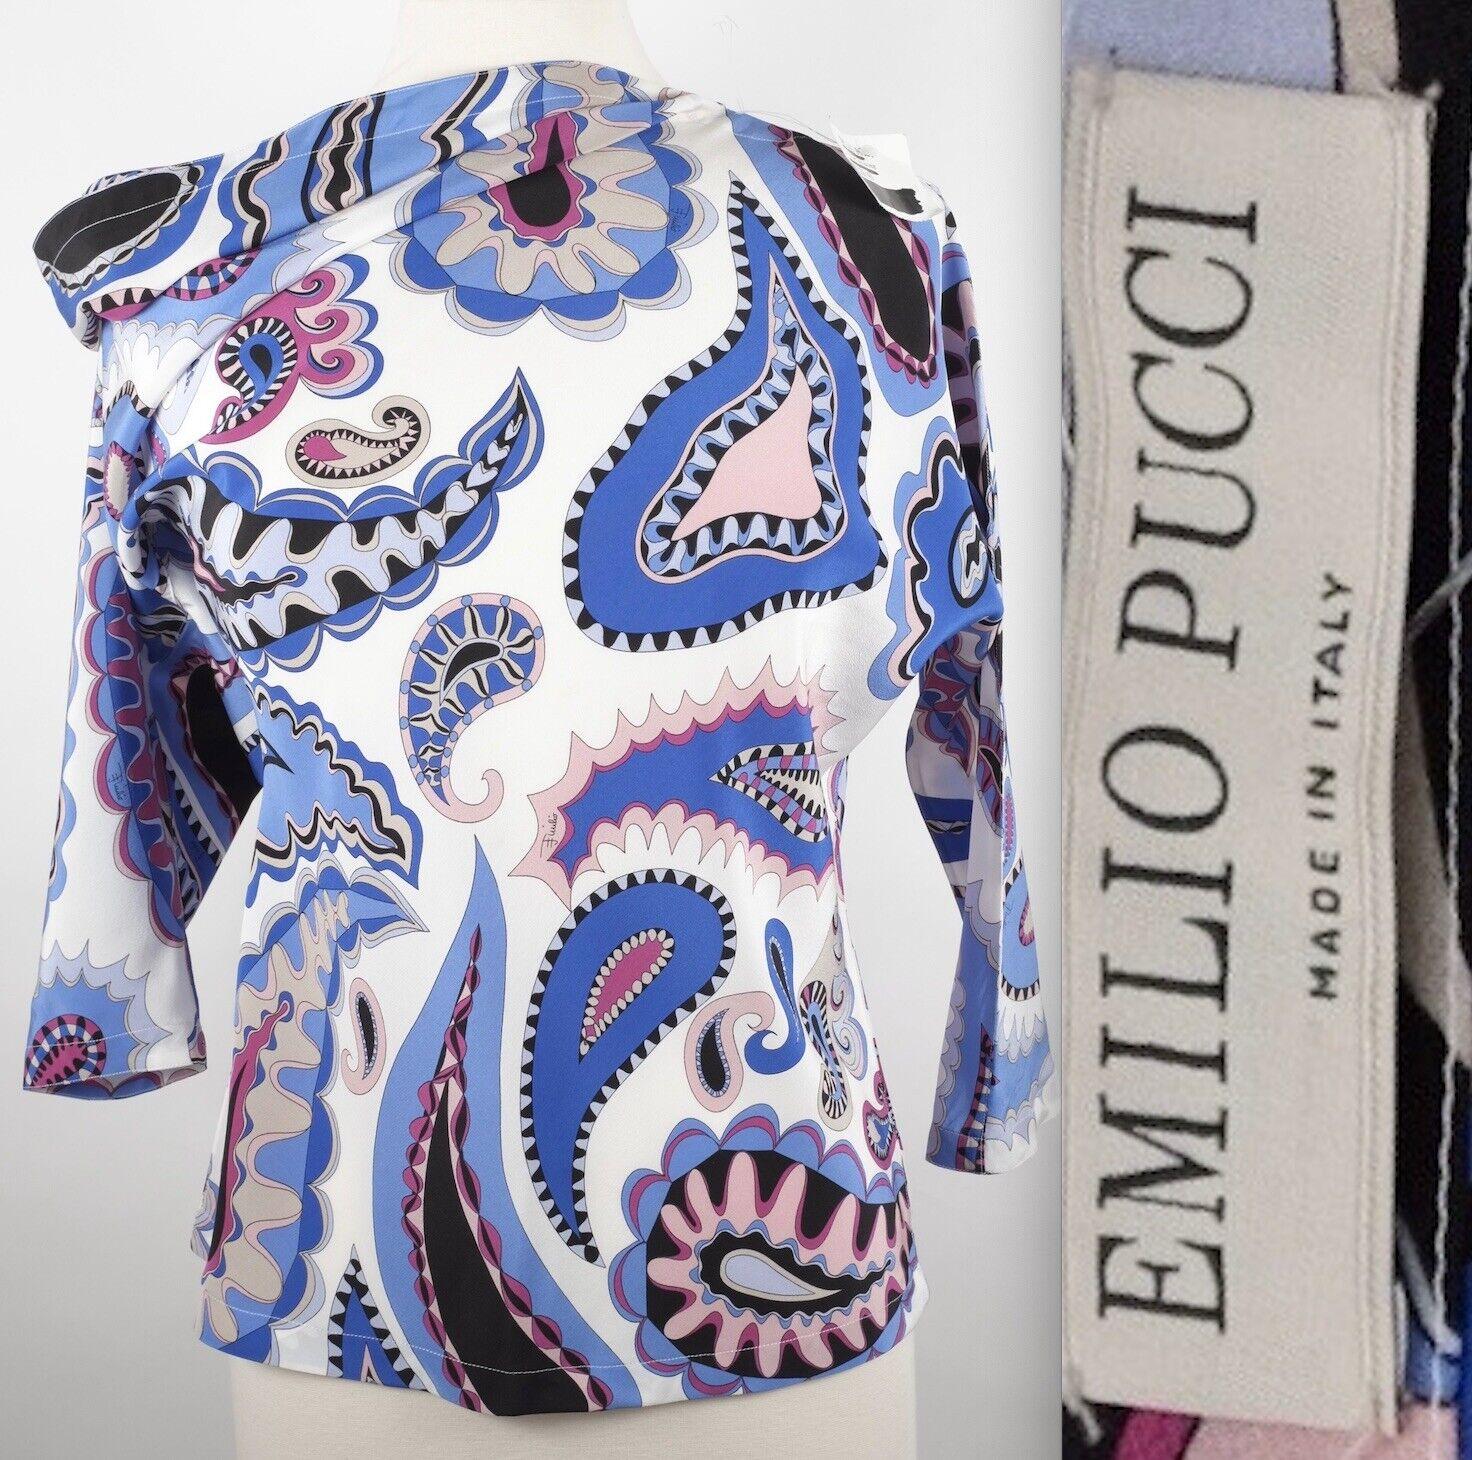 New sz 40   US 6 Emilio Pucci Weiß pasiley silk blouse top dress